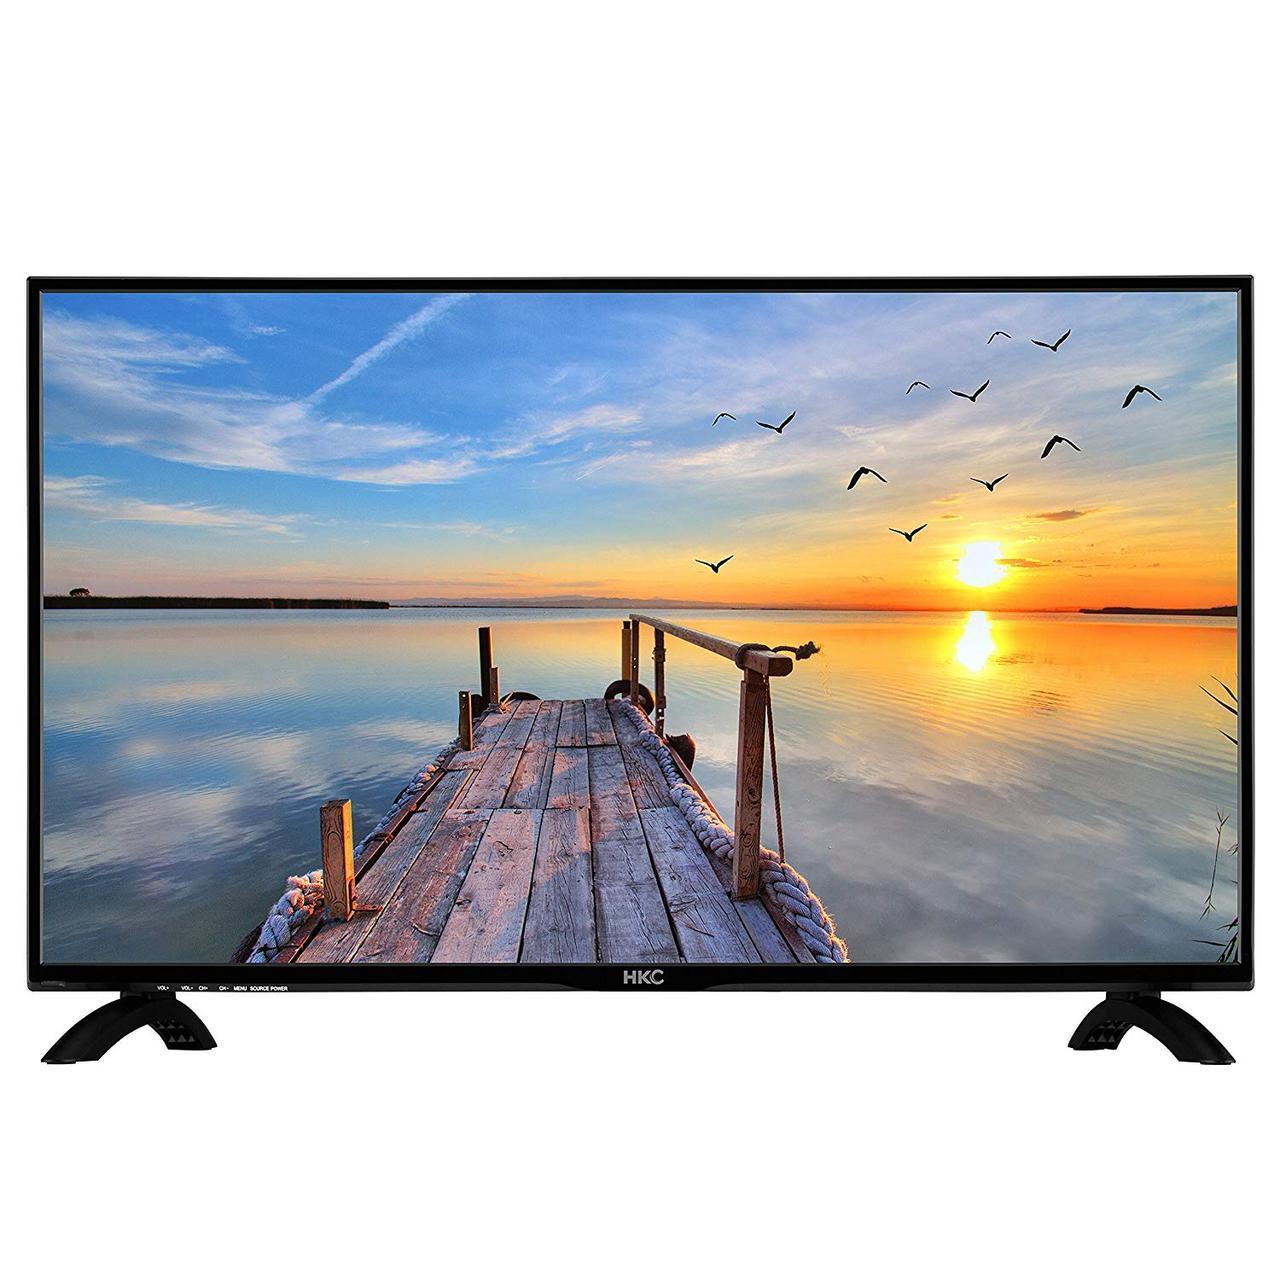 Телевизор HKC 32C9A (32 дюйма, HD Readu, 400 Гц, HDMI, USB)